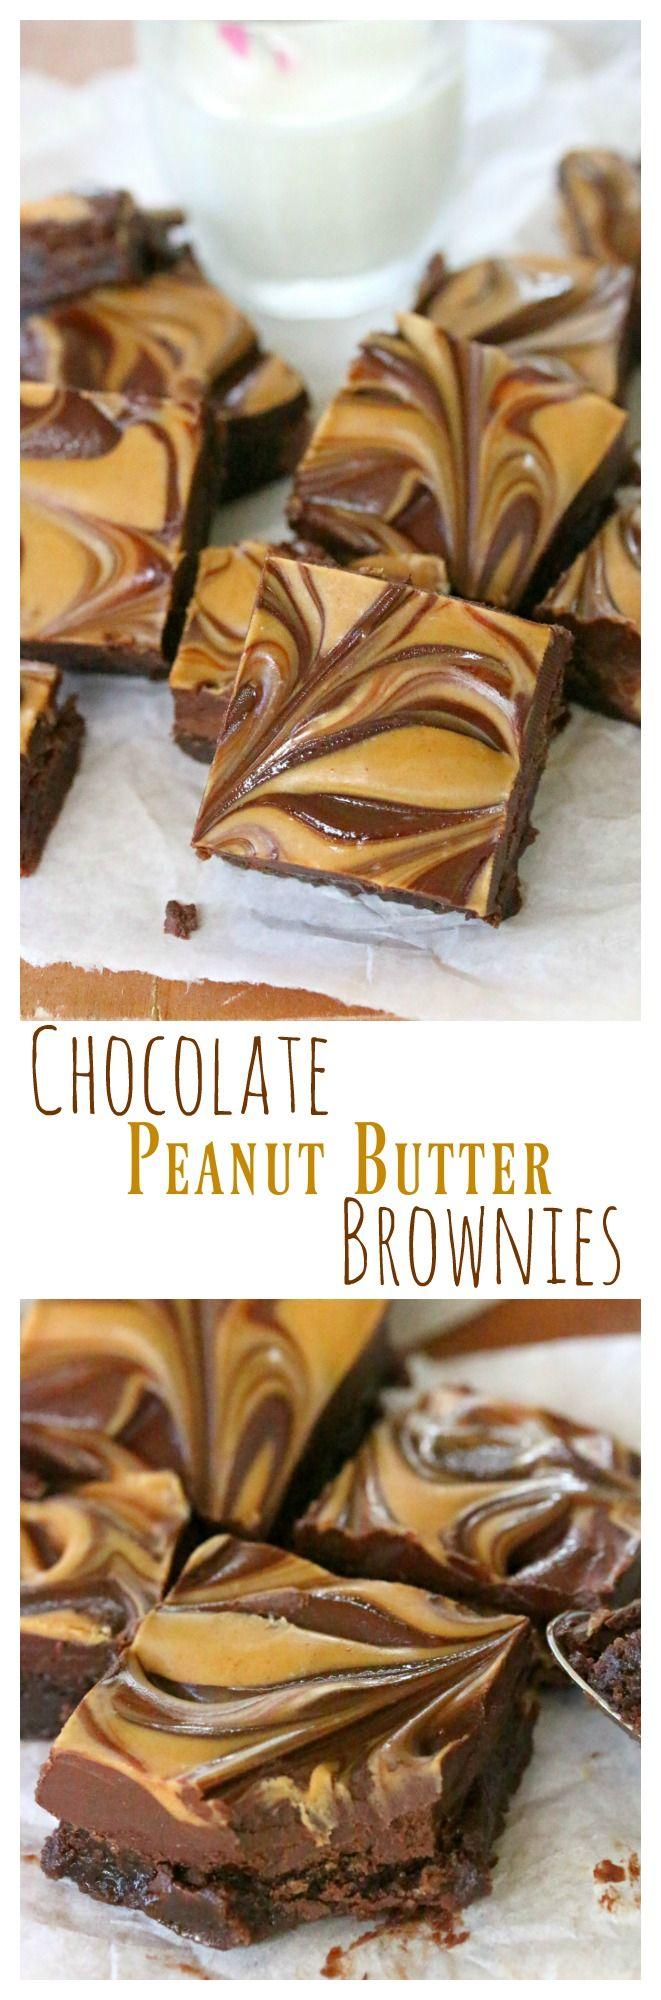 Chocolate Peanut Butter Brownies: Savory swirls of peanut butter and chocolate over brownies loaded with with chunks of peanut butter cups. #Brownies #PeanutButter